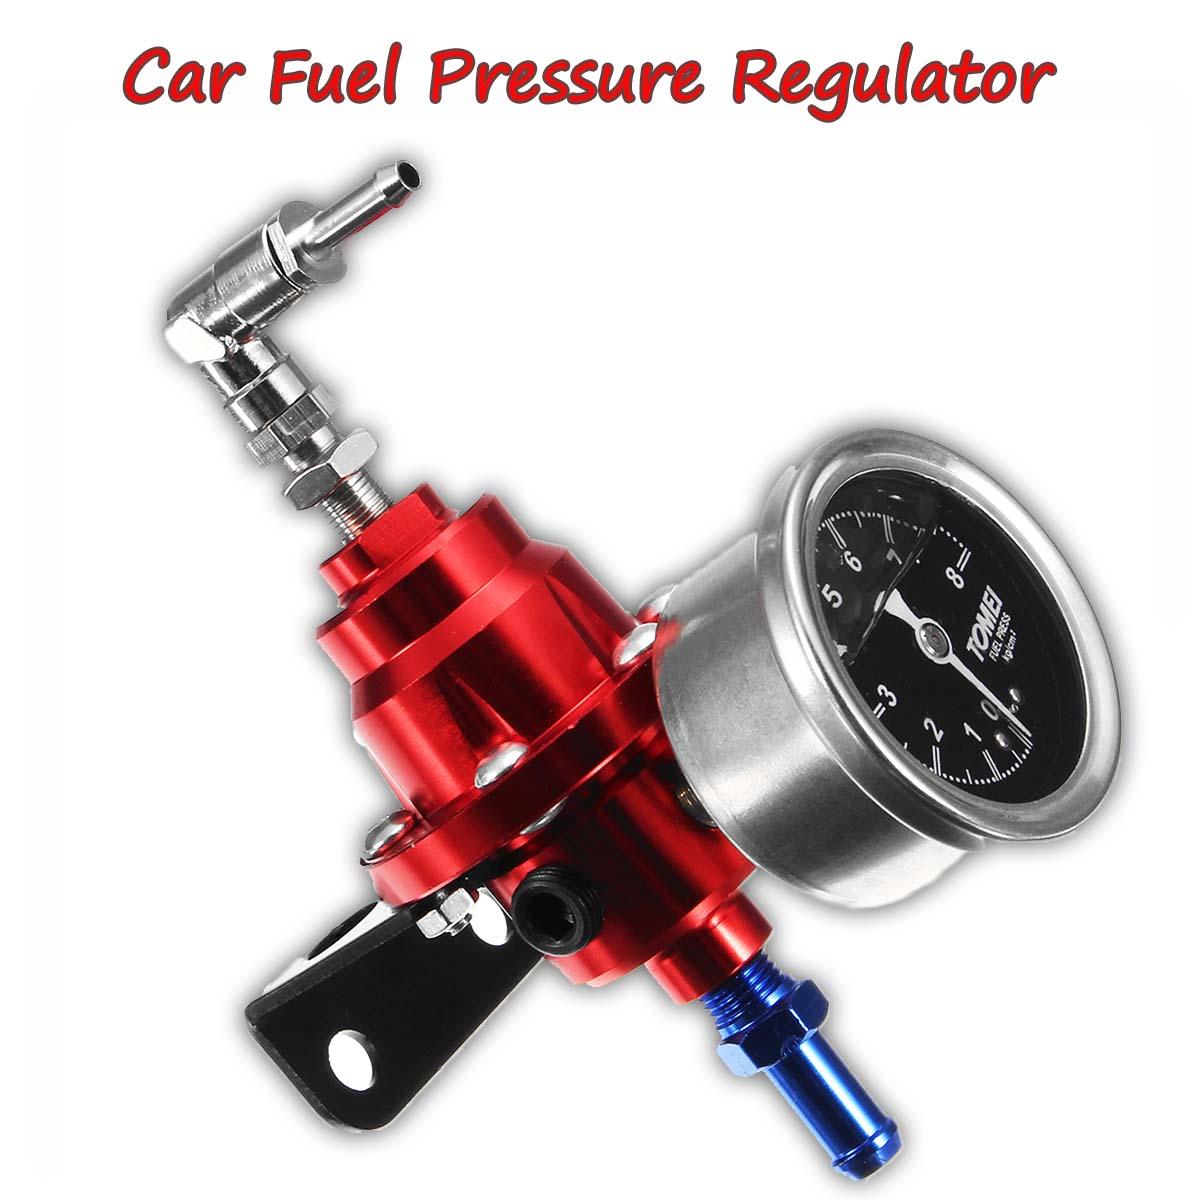 Universal Adjustable Car Fuel Hose Auto Pressure Regulator With 160PSI Oil Gauge Kit